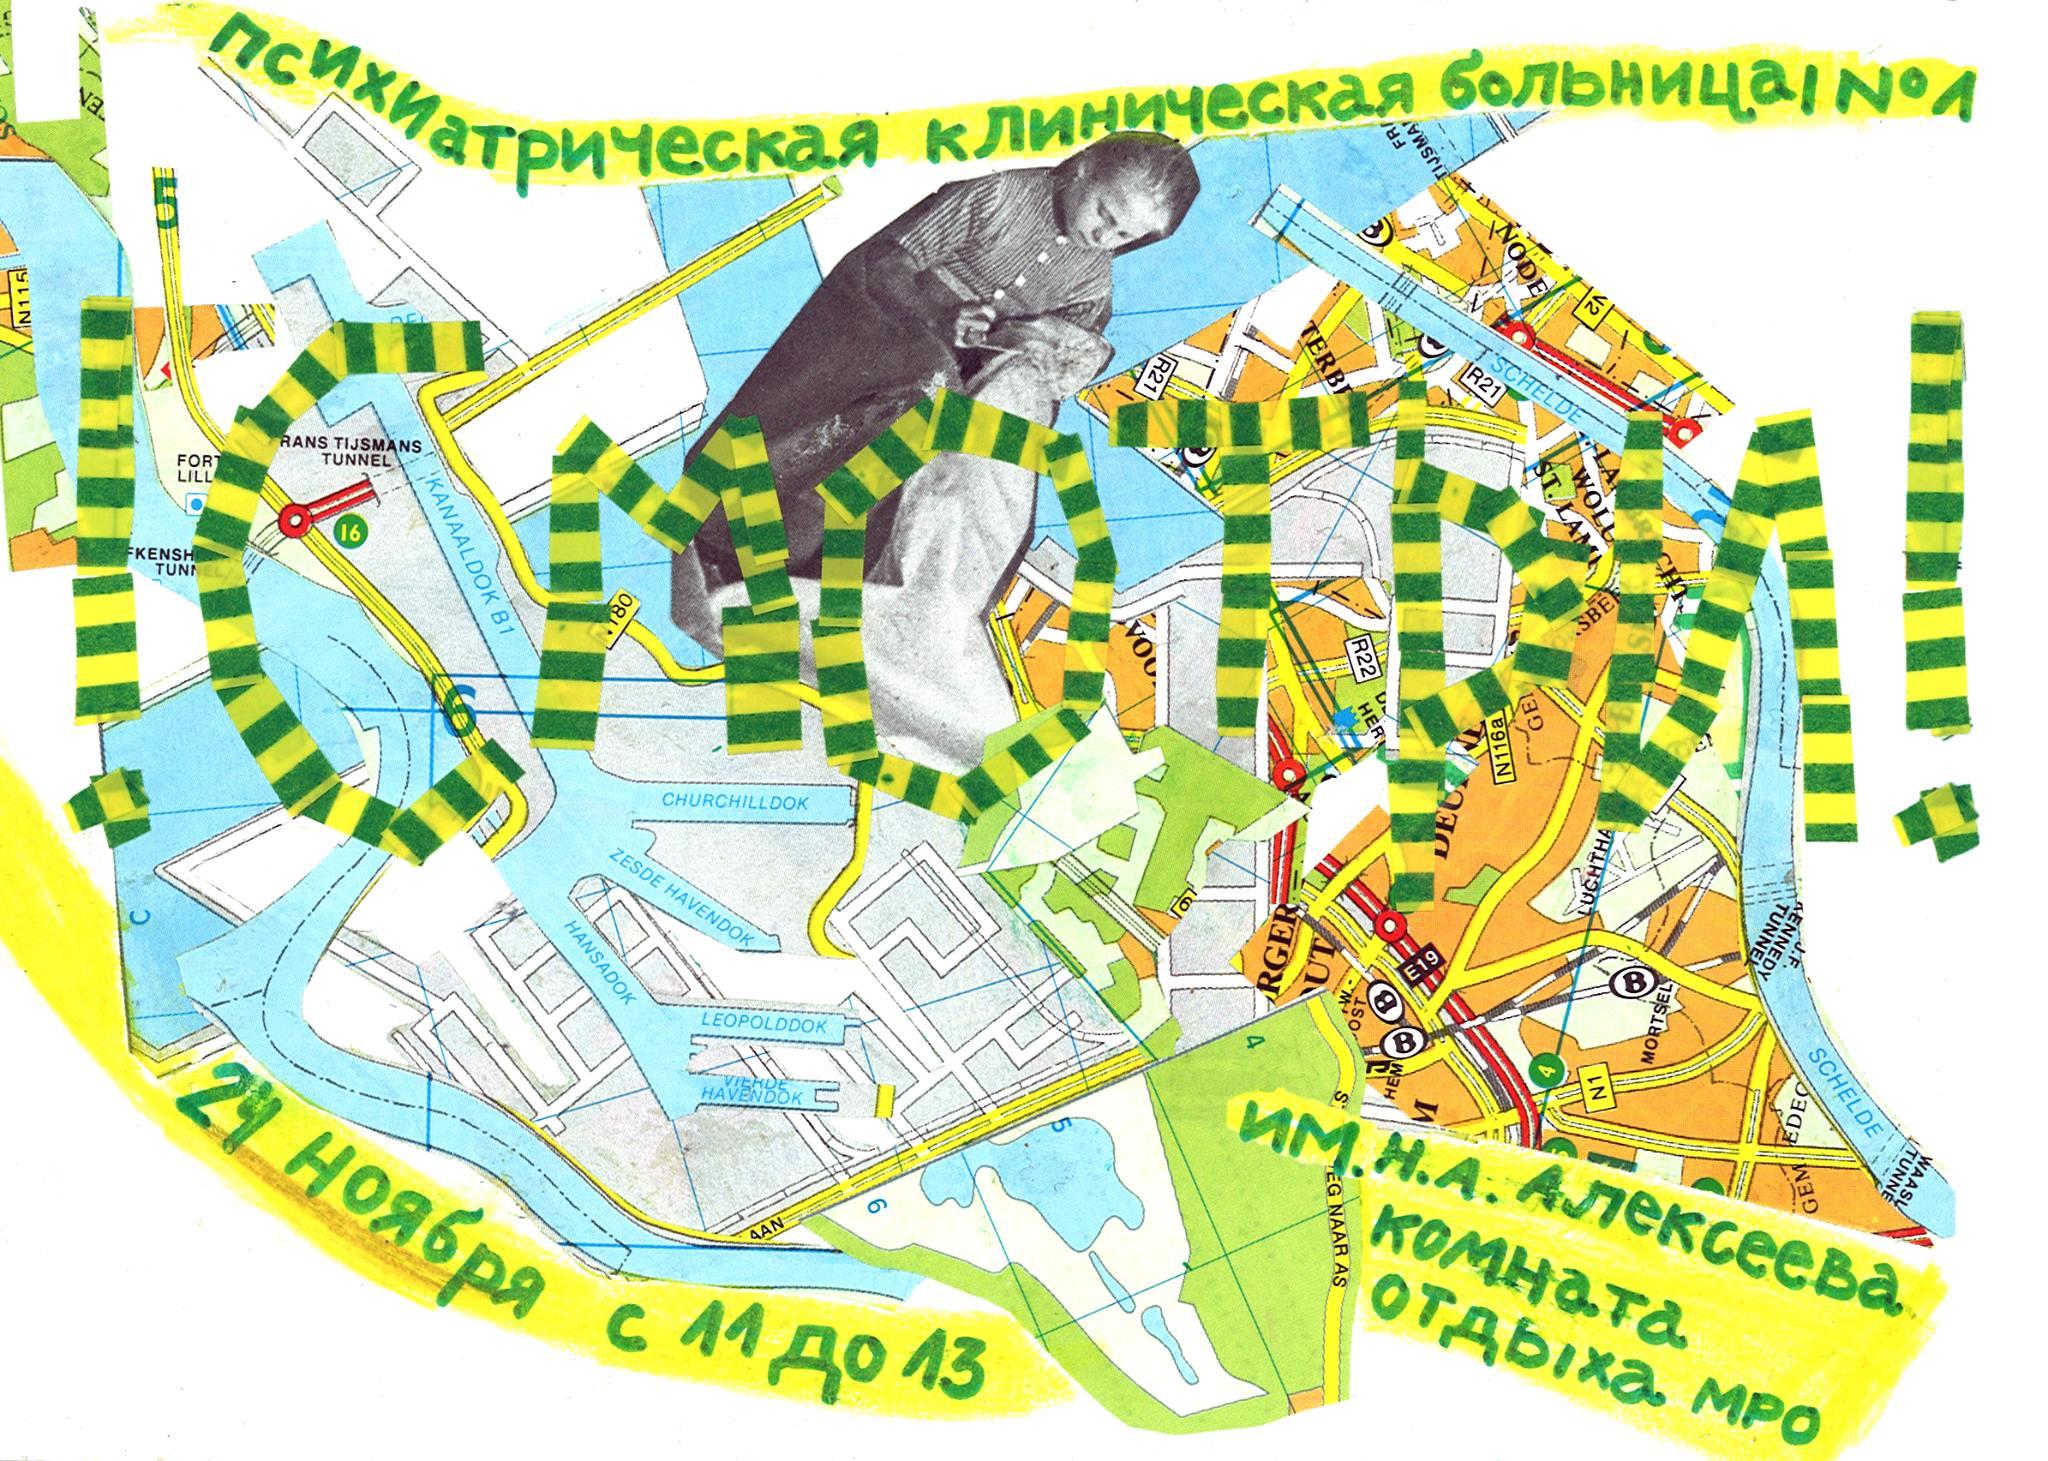 KIJK - poster # 19 - november (Moscow).jpg